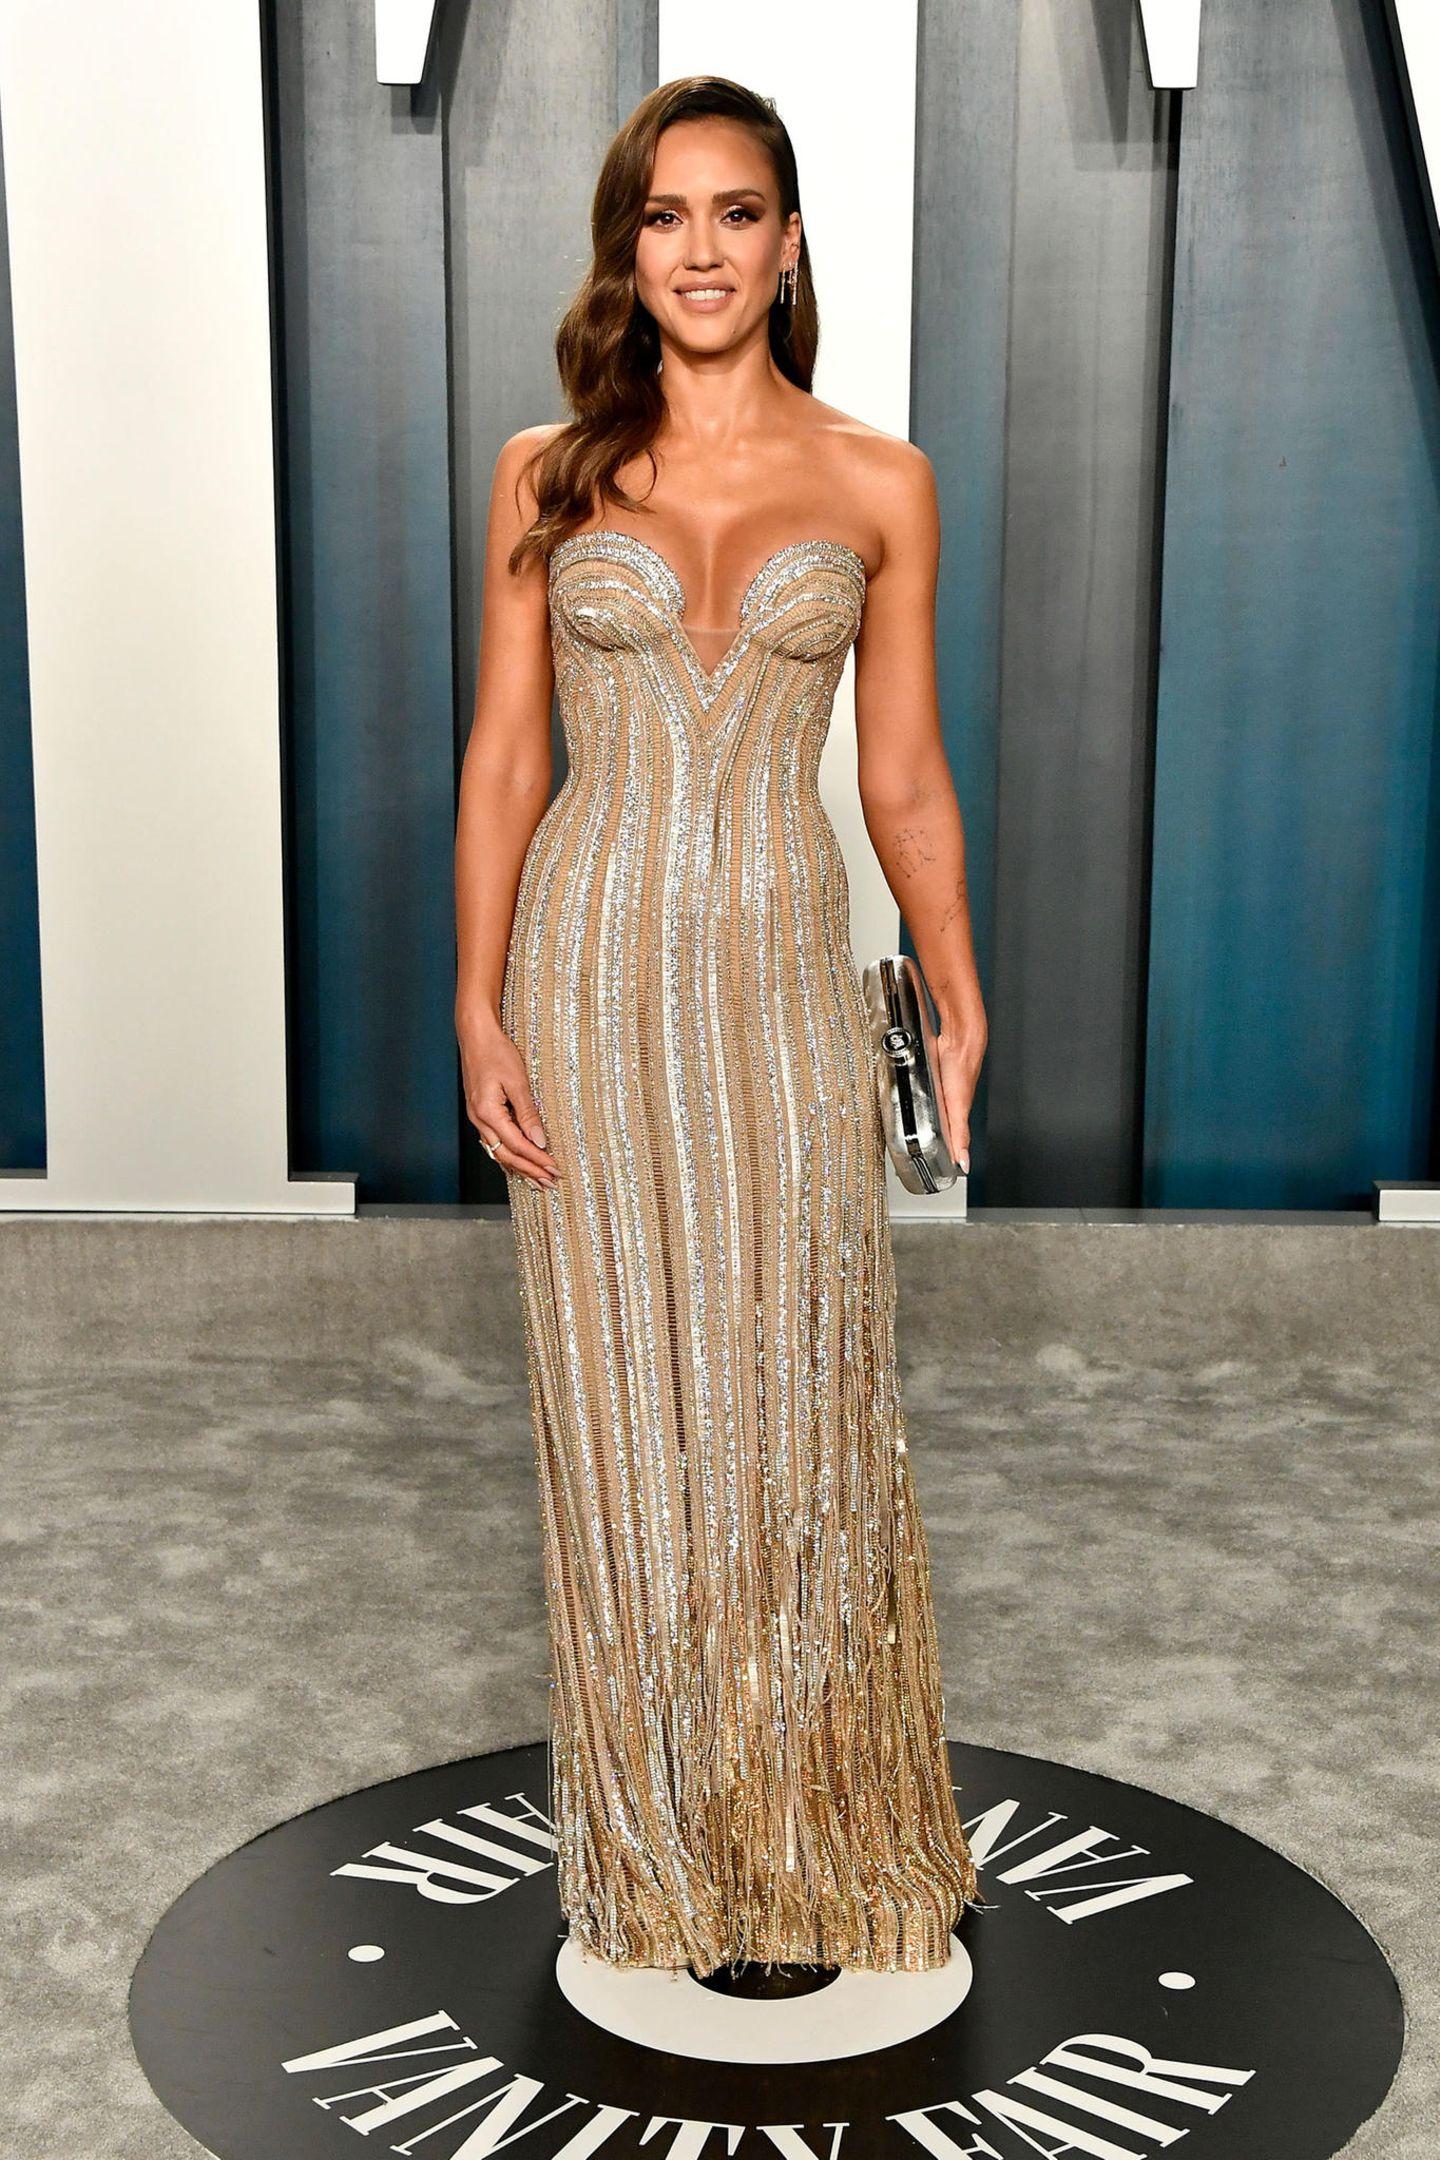 Oscars 9 Die besten Looks der Aftershowpartys   GALA.de